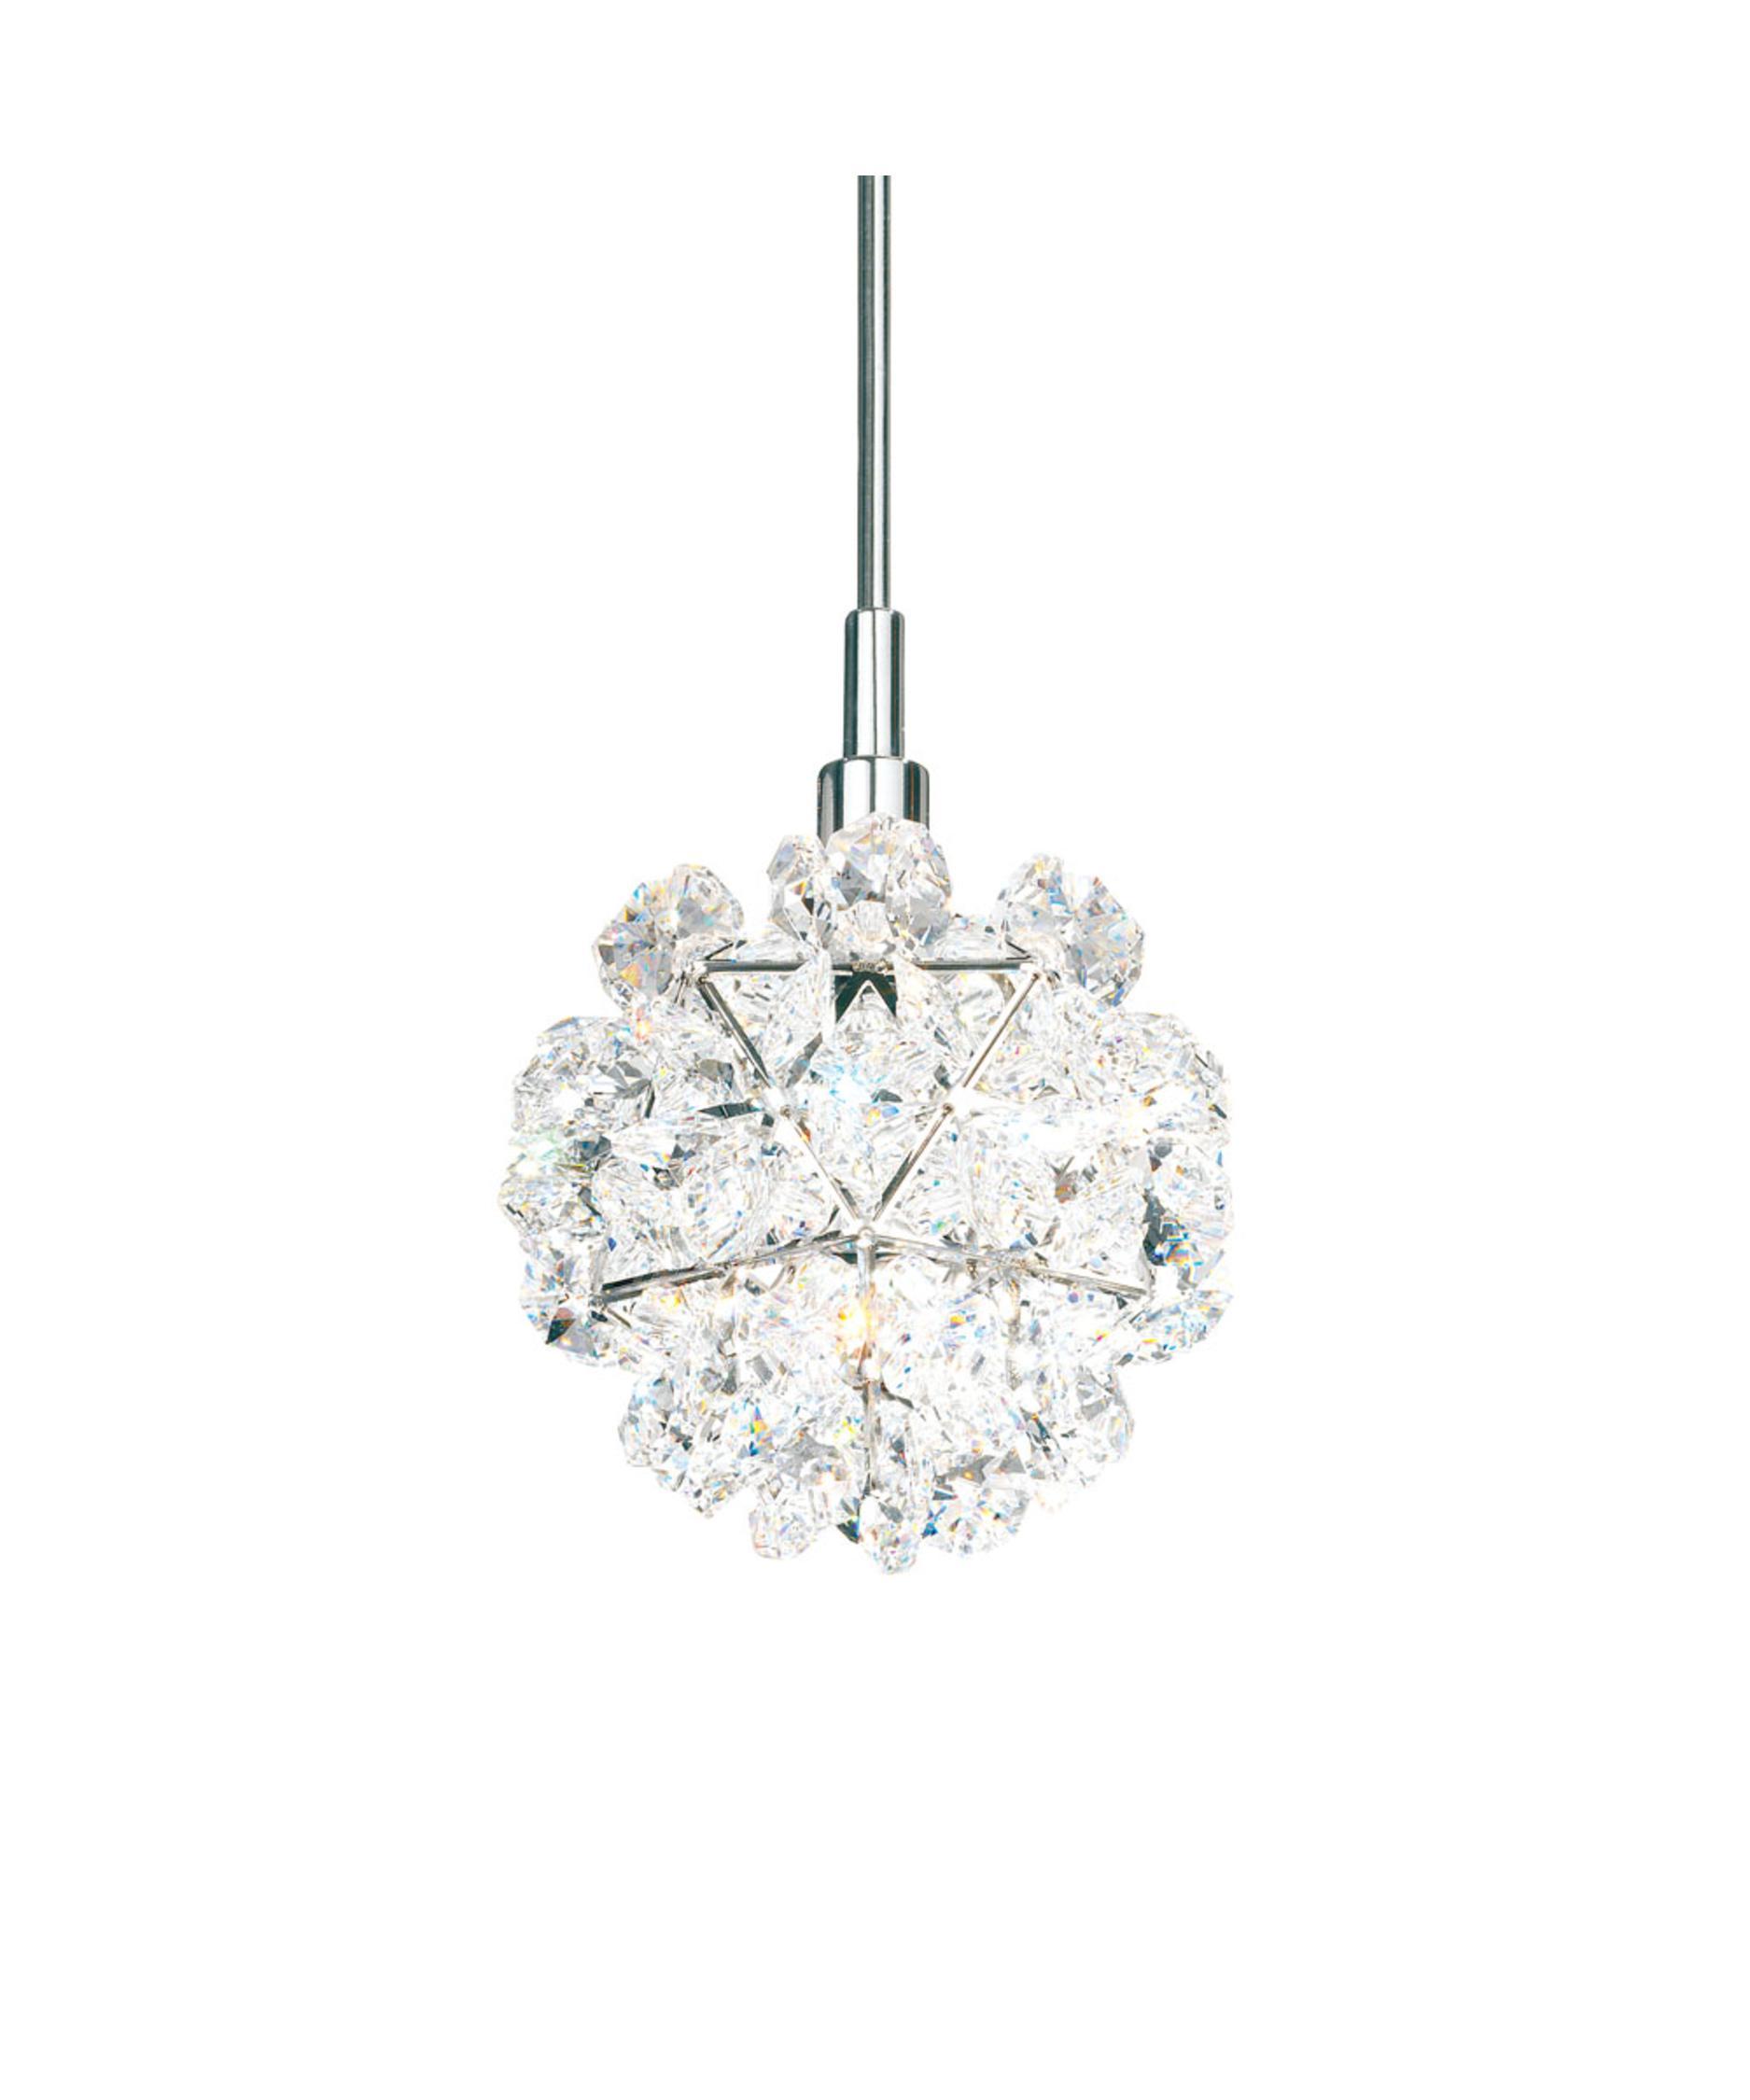 Swarovski Crystal Pendant Lights Roselawnlutheran